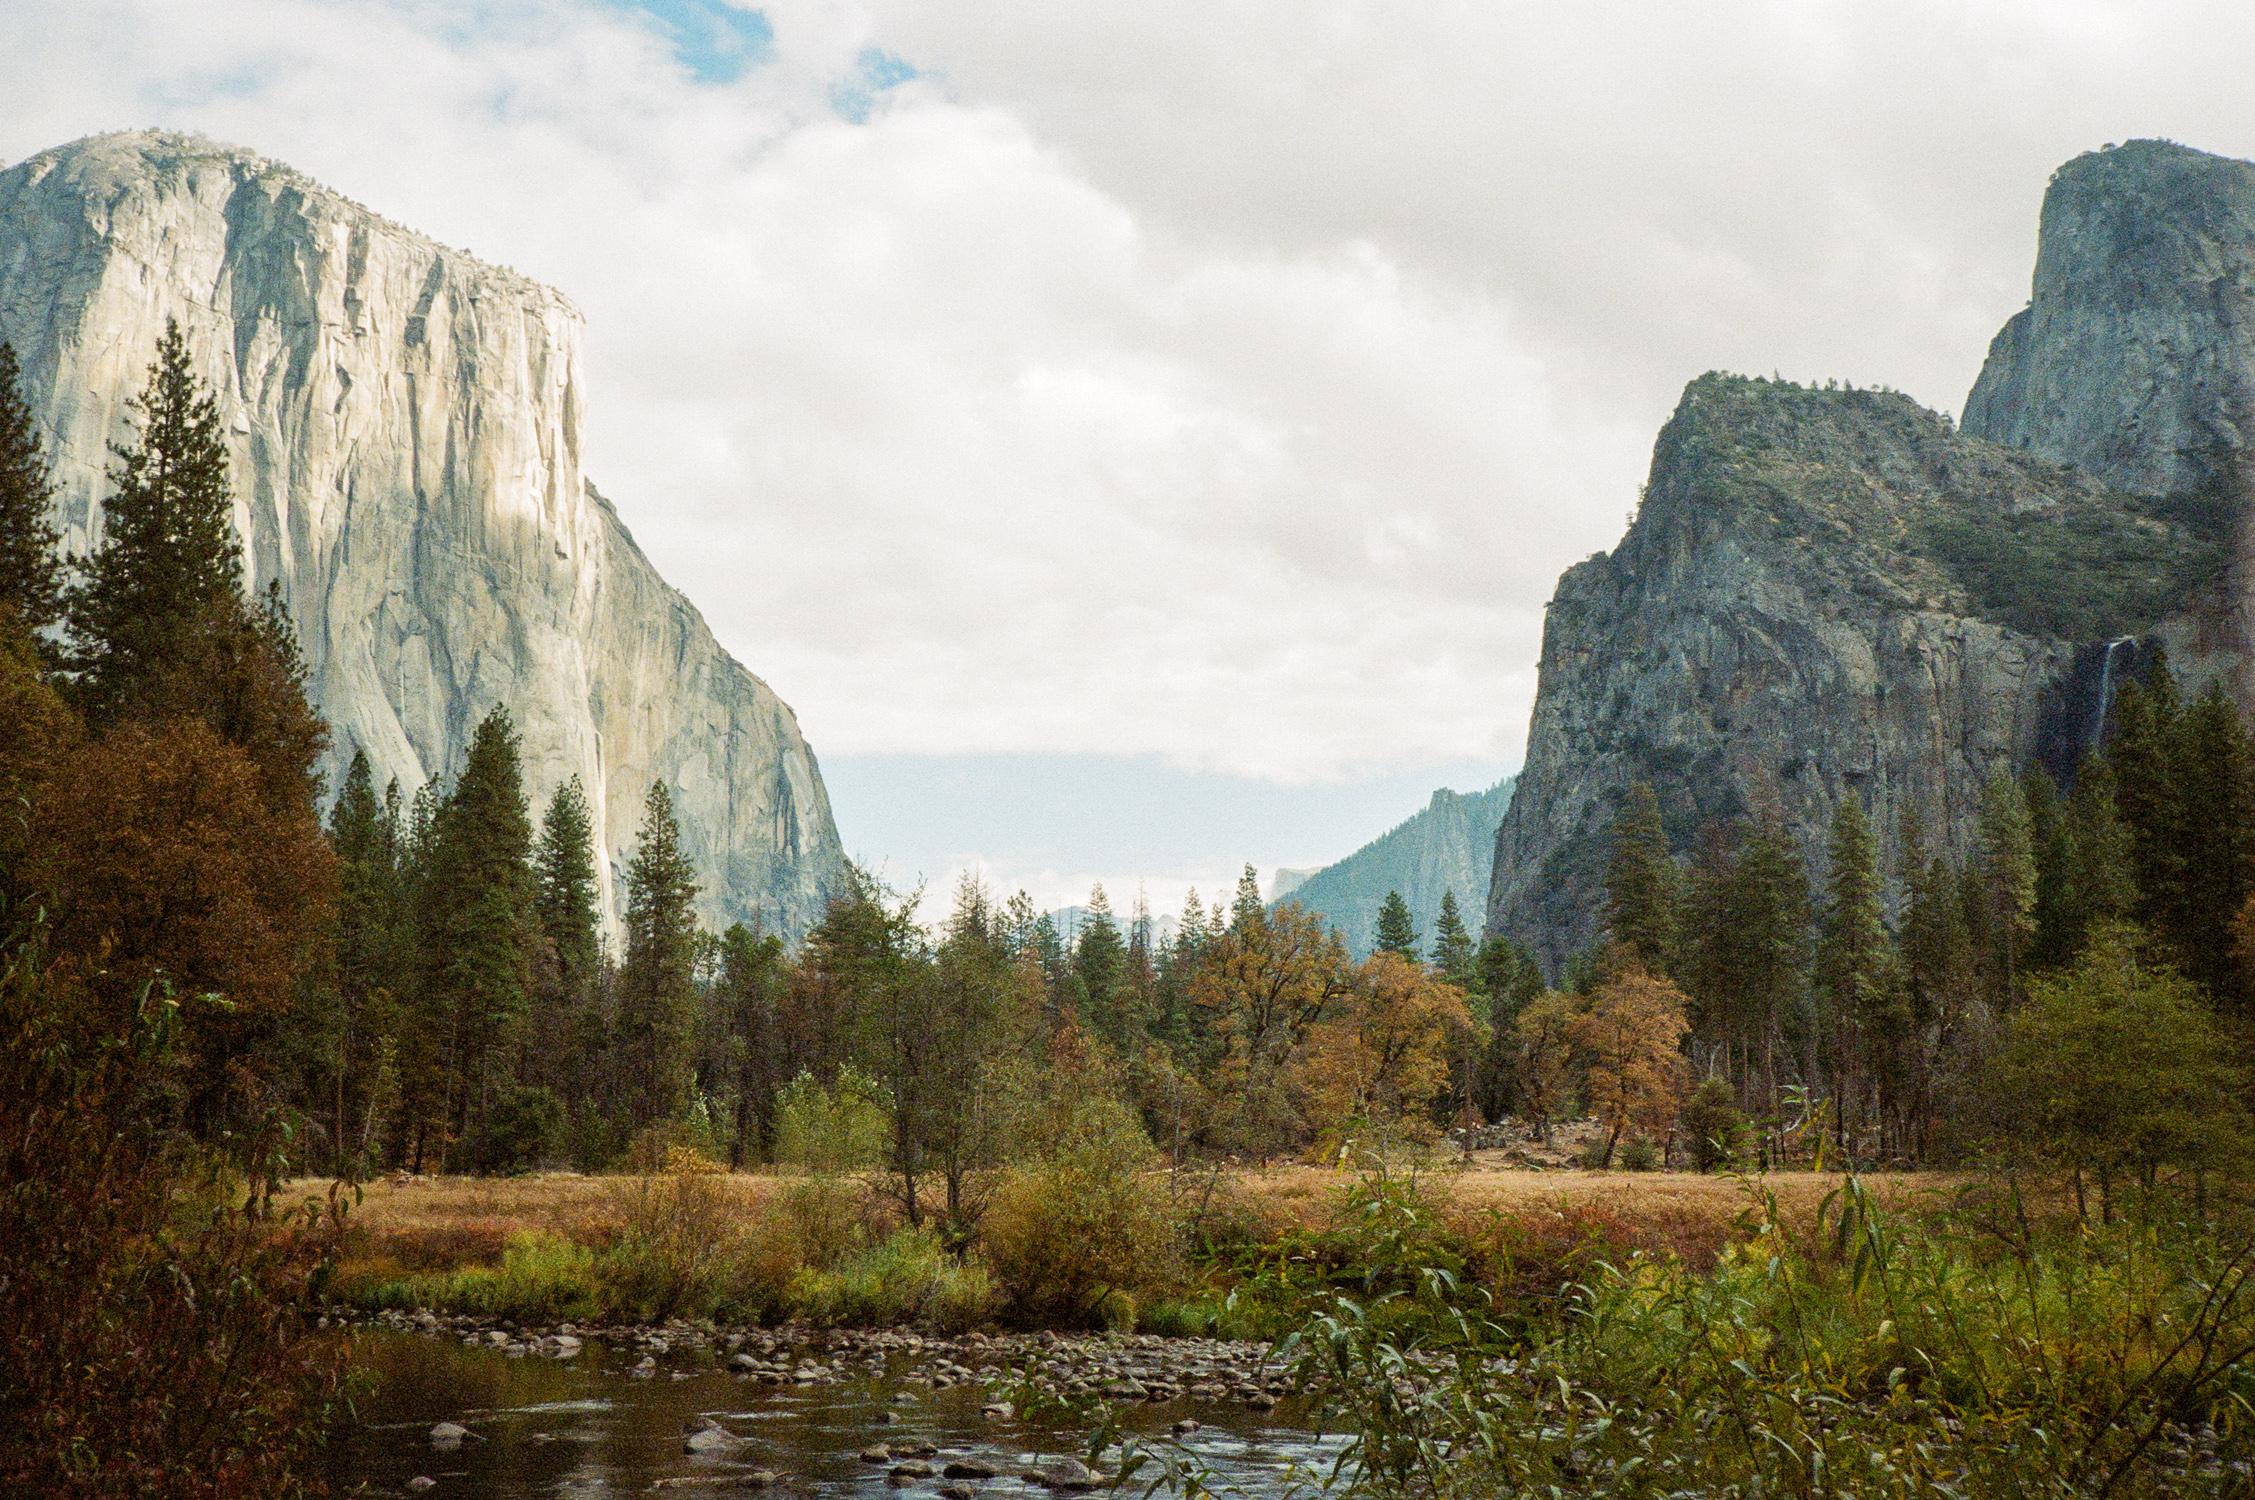 Yosemite elopement photographer Jessica Schilling